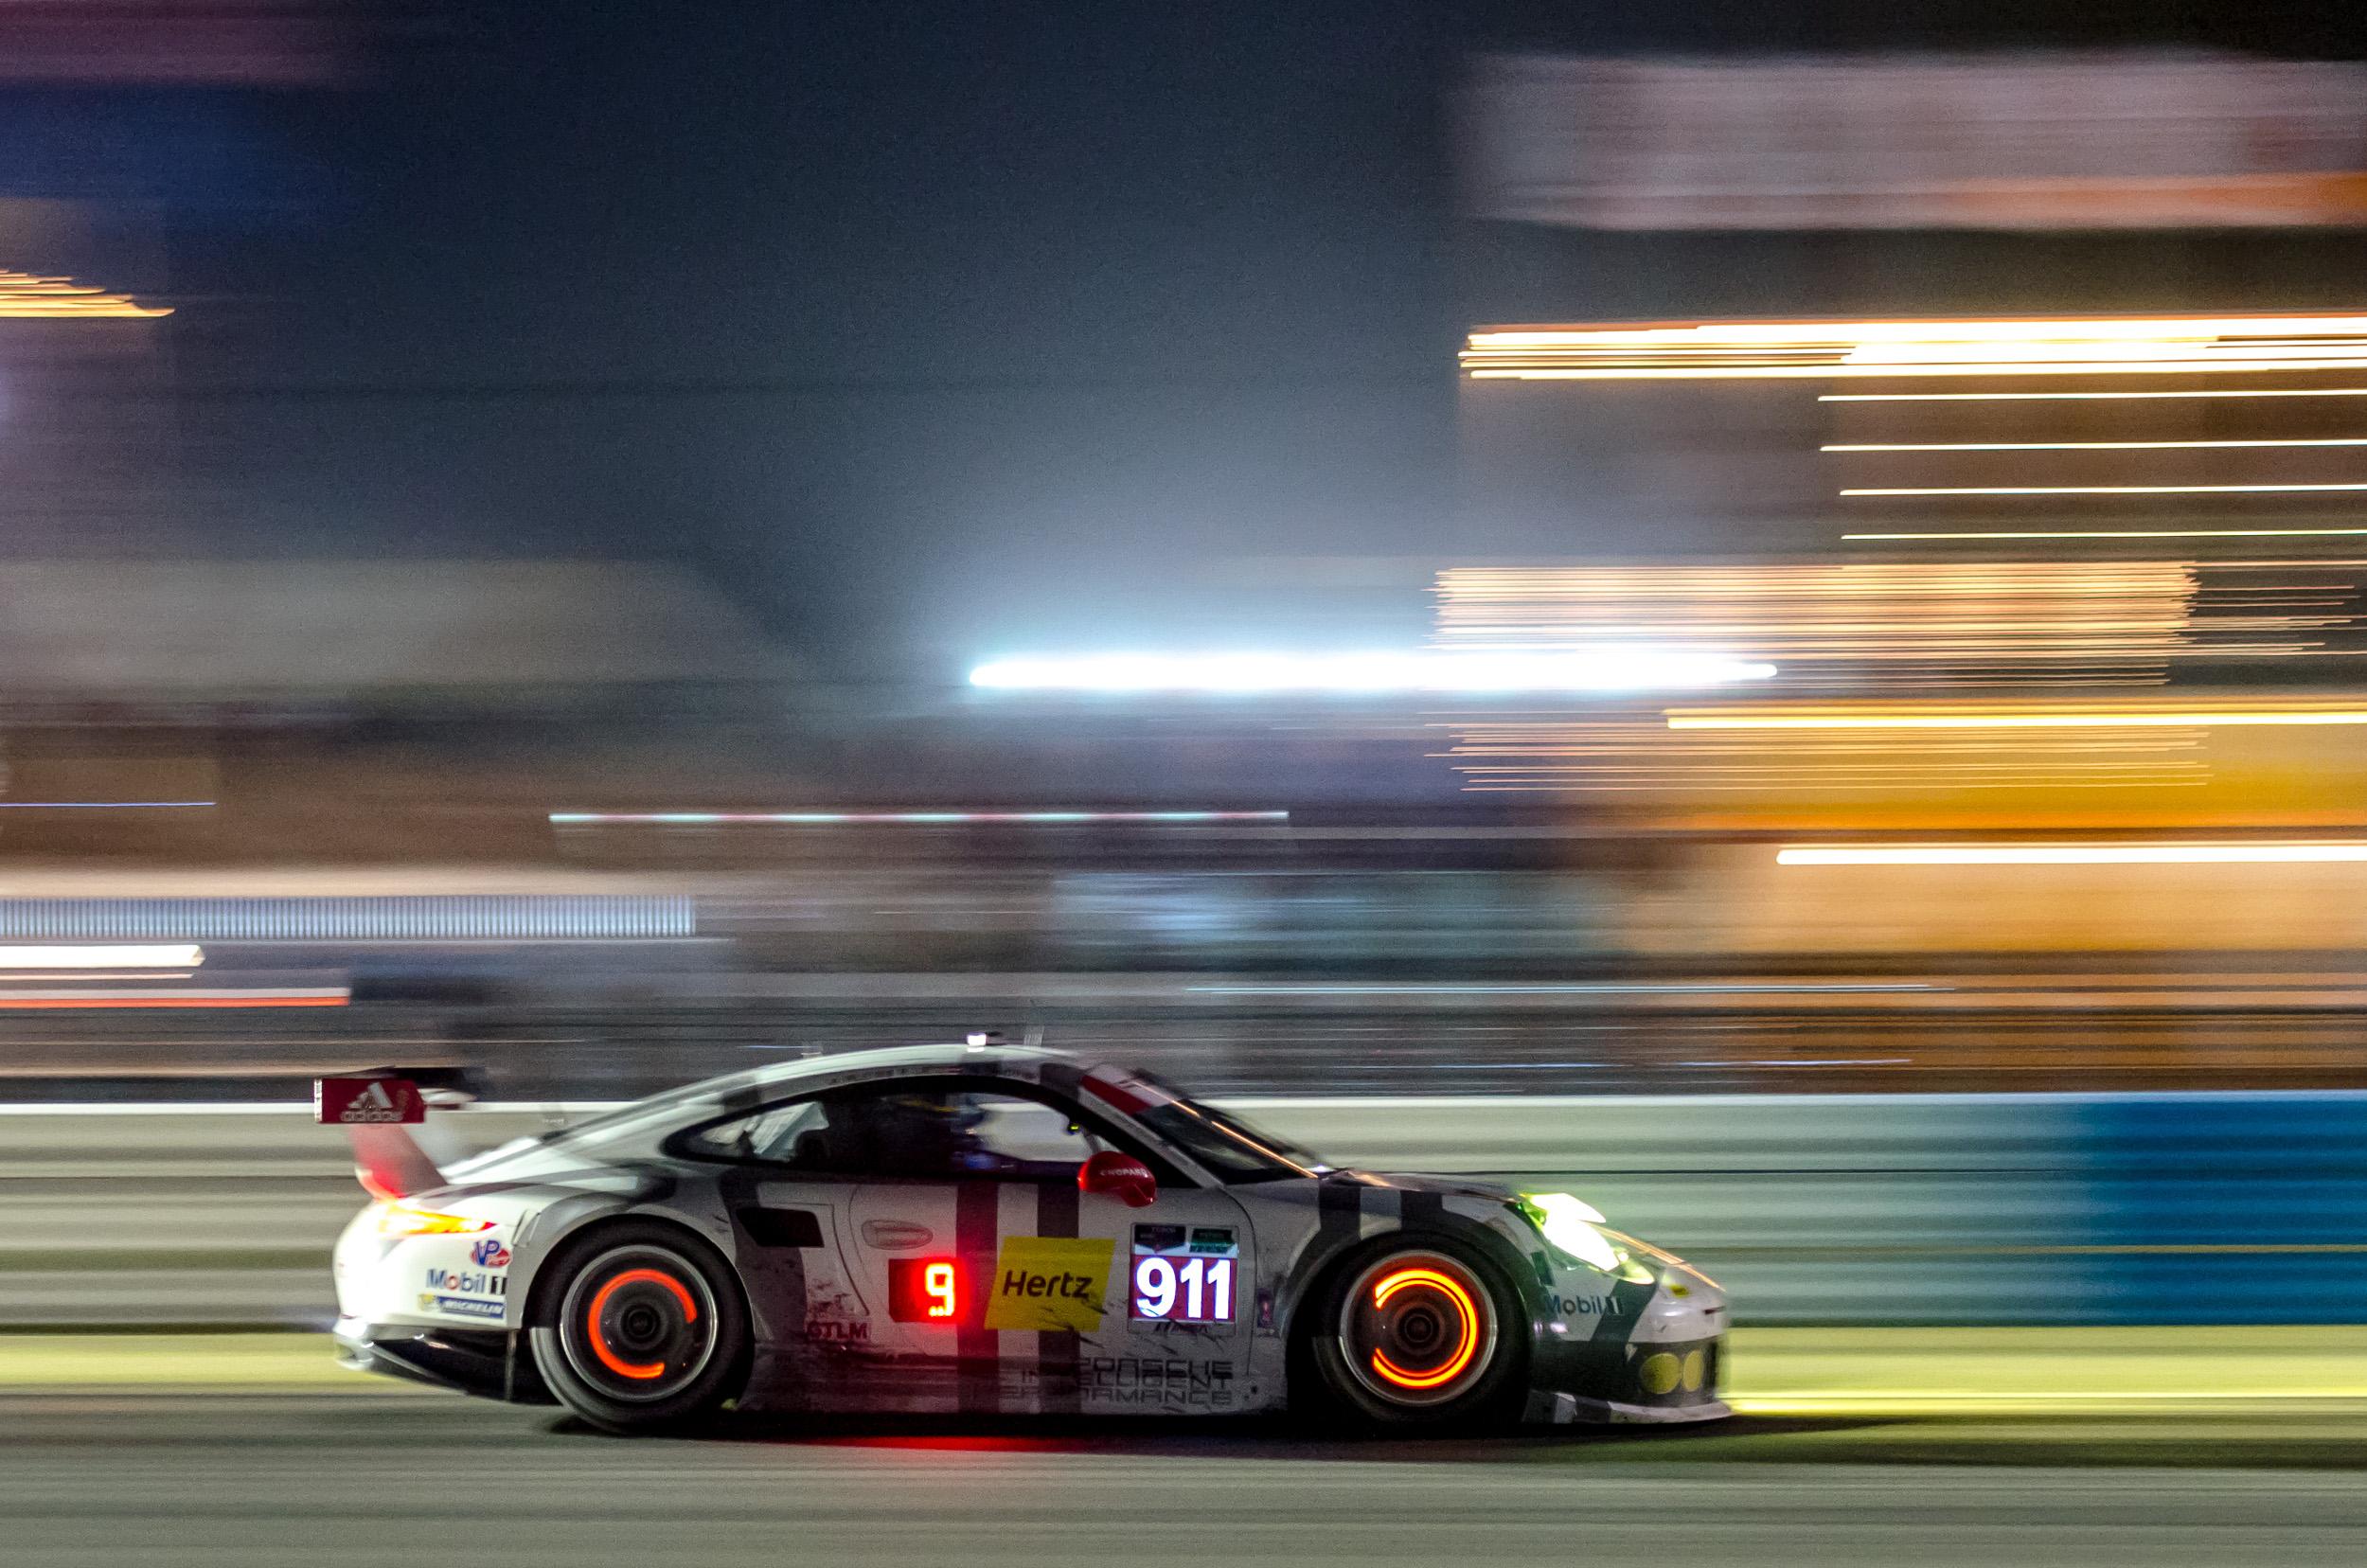 Wallpaper Night Vehicle Nikon Porsche 911 Sports Car